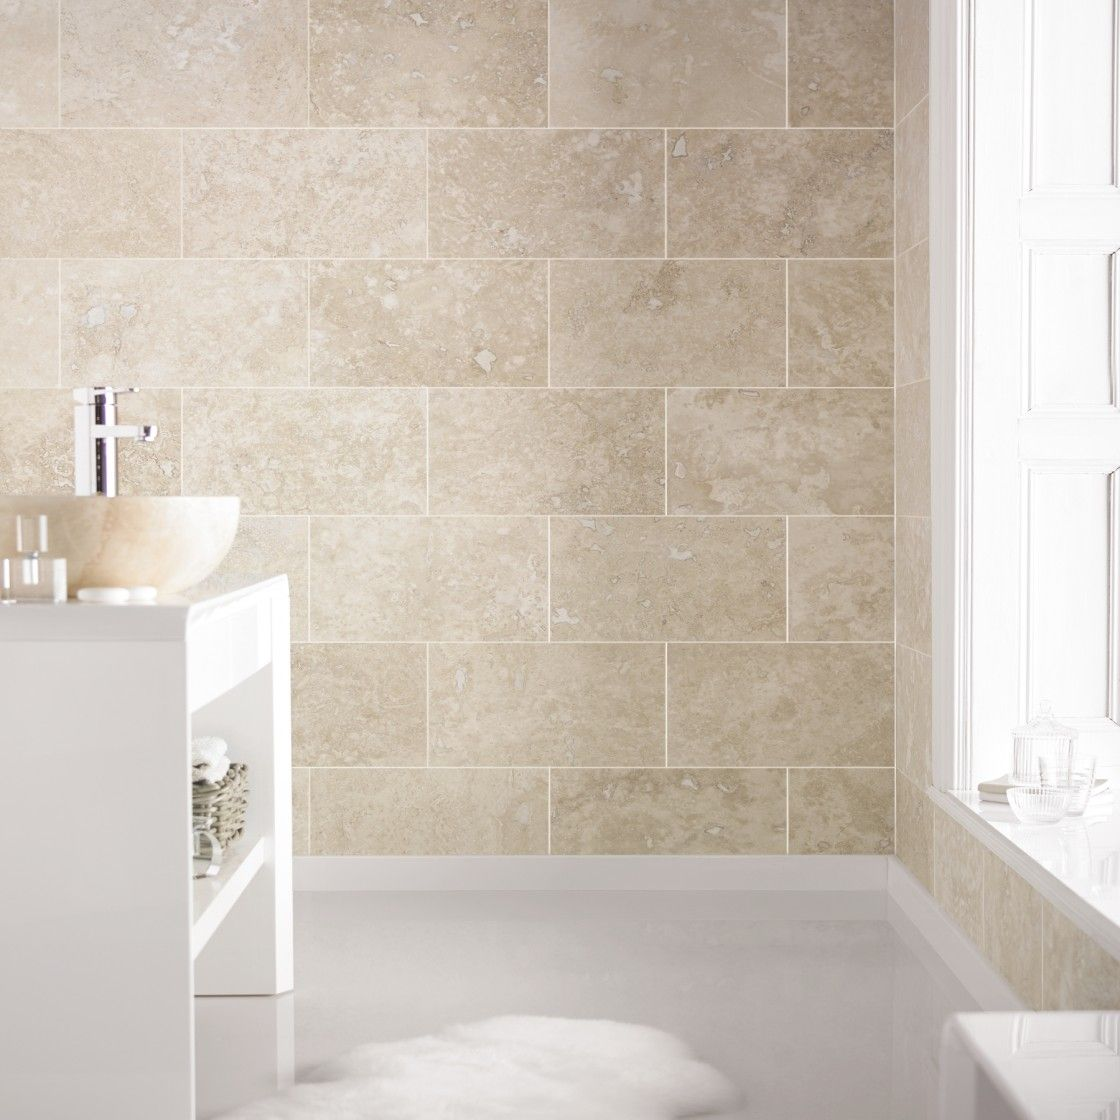 Is Travertine Tile Durable | Tile Design Ideas